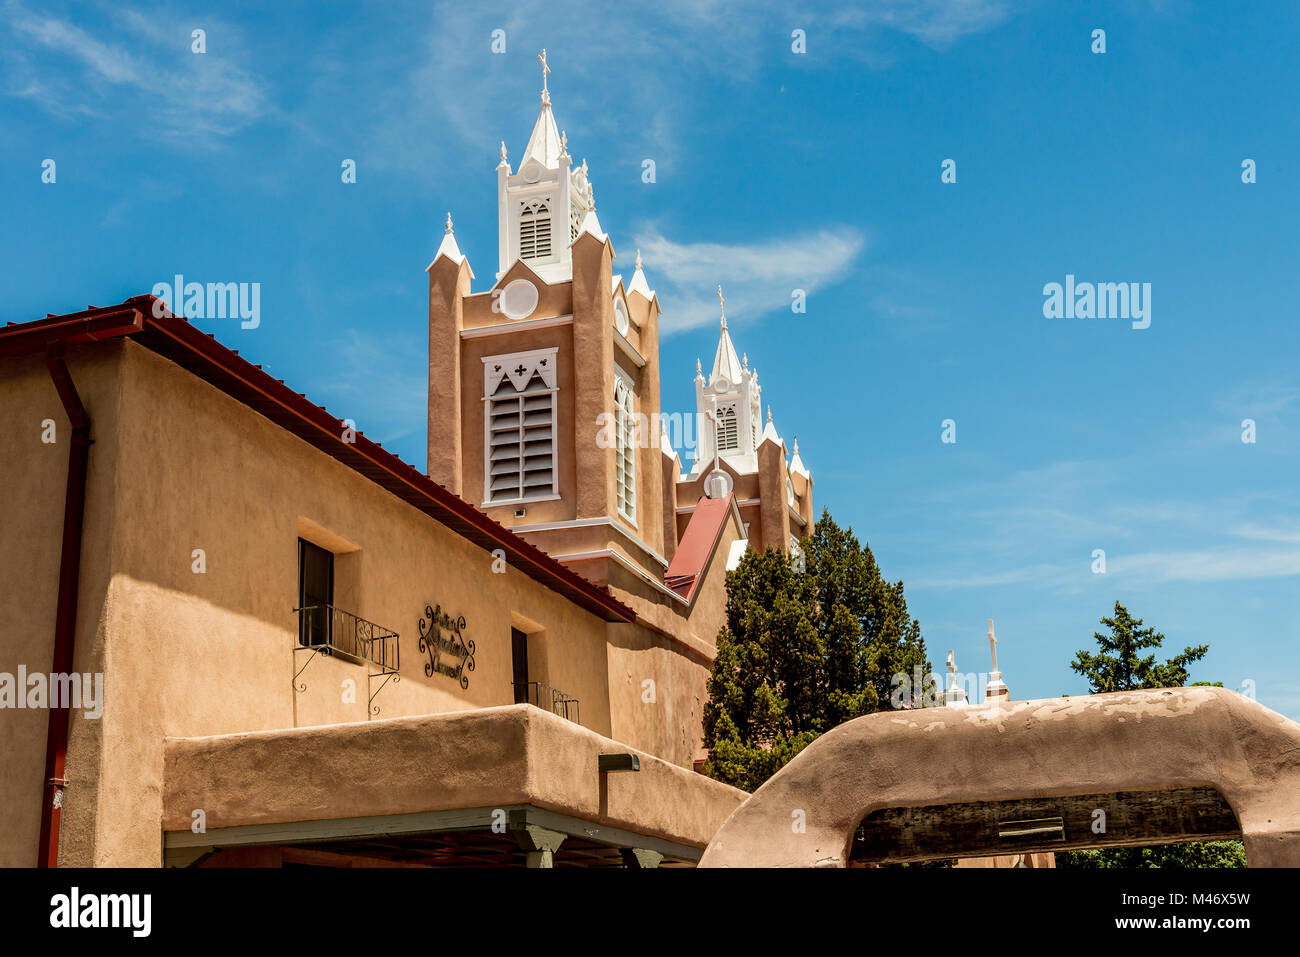 san felipe de neri catholic church The san felipe neri parish church is located at boni avenue cor aglipay street, boni ave, mandaluyong city, metro manila it is the oldest catholic church in mandaluyong city.